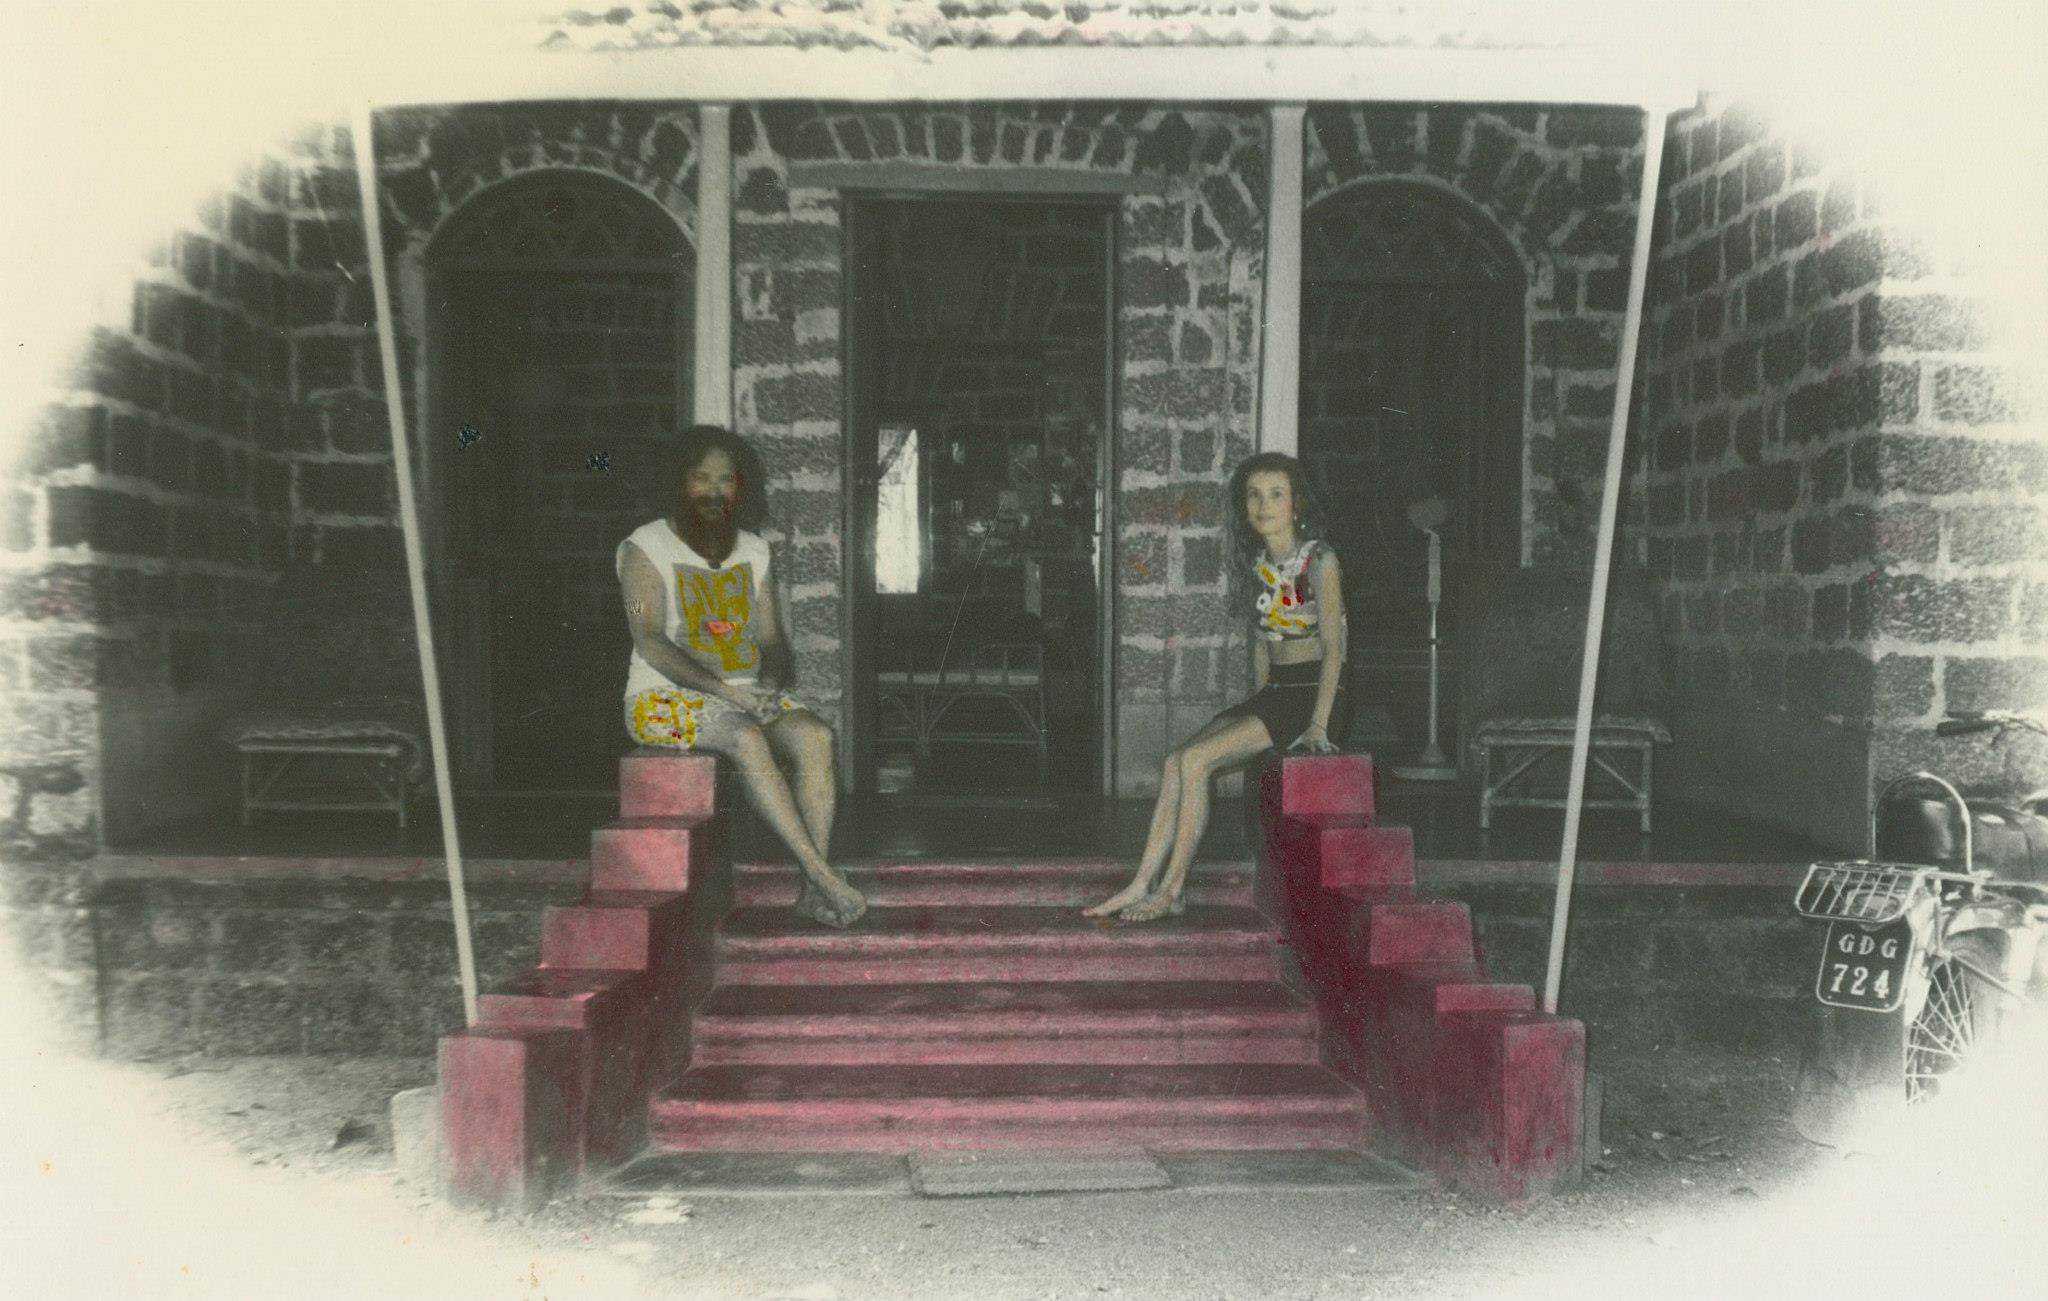 Goa Gil и Arriane в их доме в Гоа. Фото сделано в начале 1970х (Photo by Goa Gil).